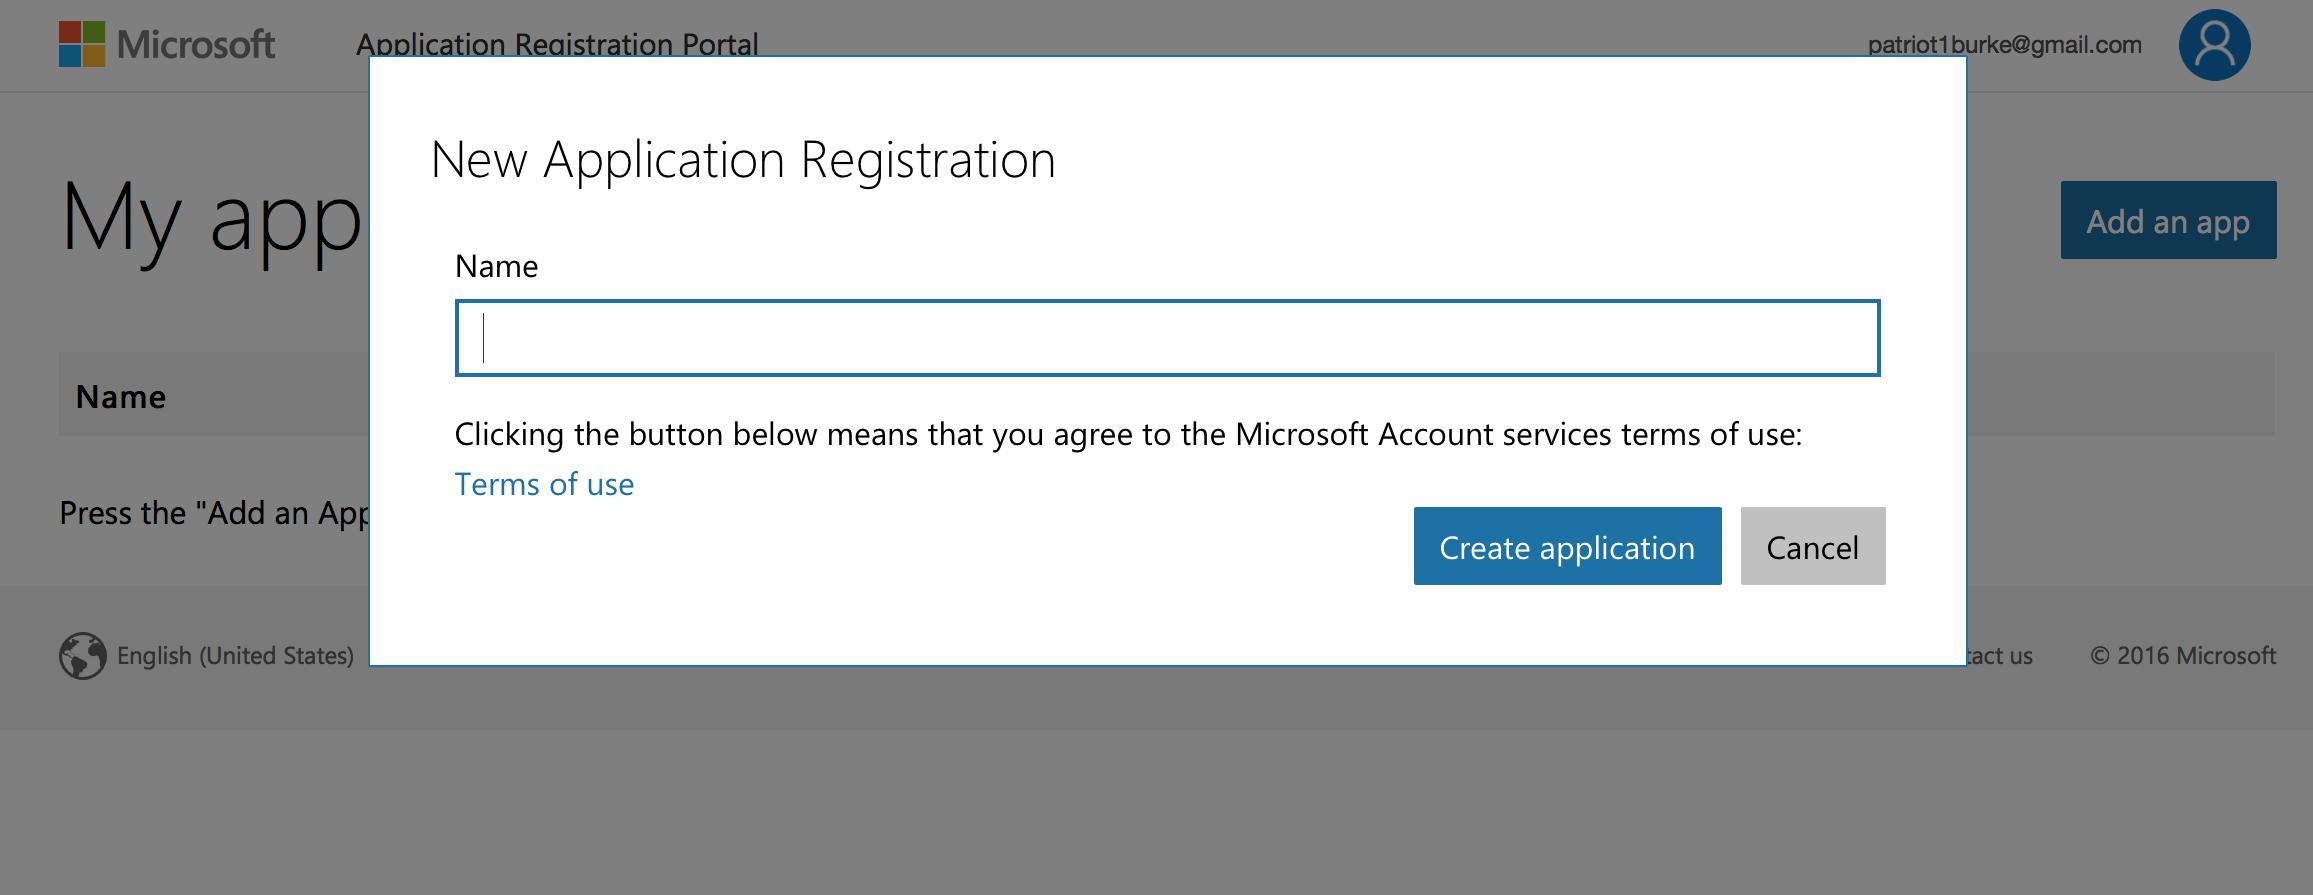 microsoft app register